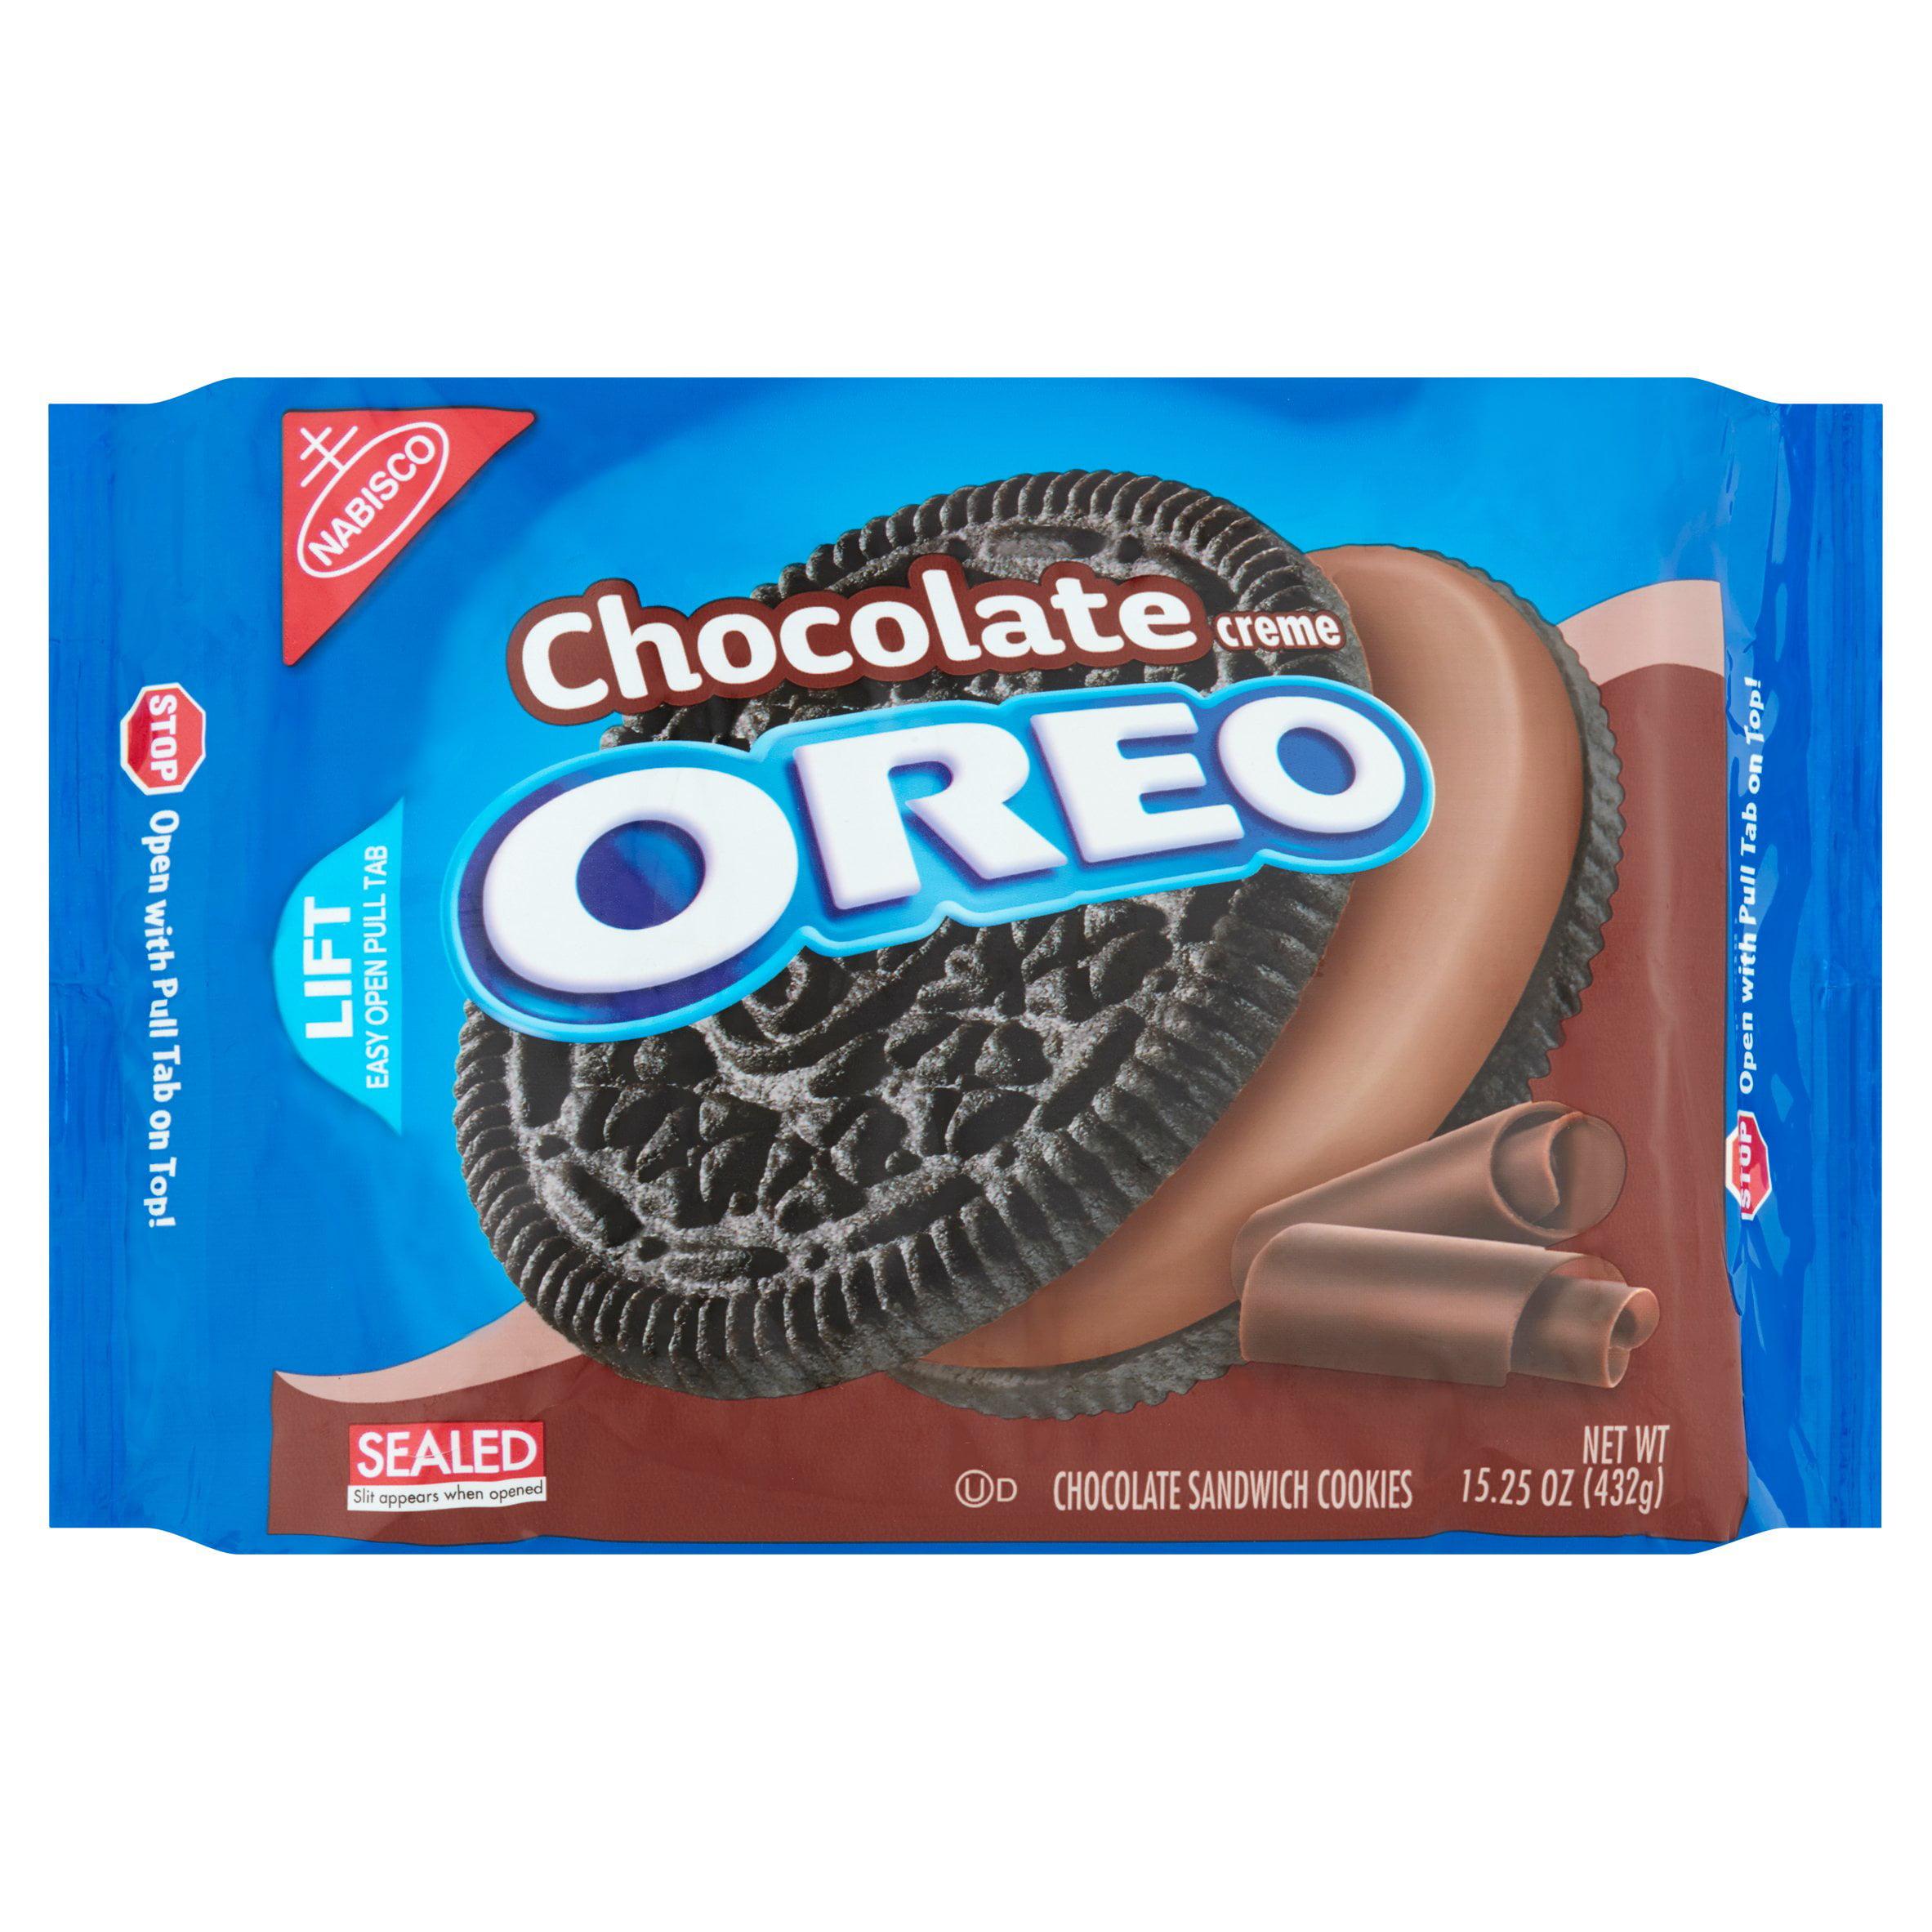 Nabisco Oreo Chocolate Sandwich Cookies Chocolate Creme, 15.25 OZ